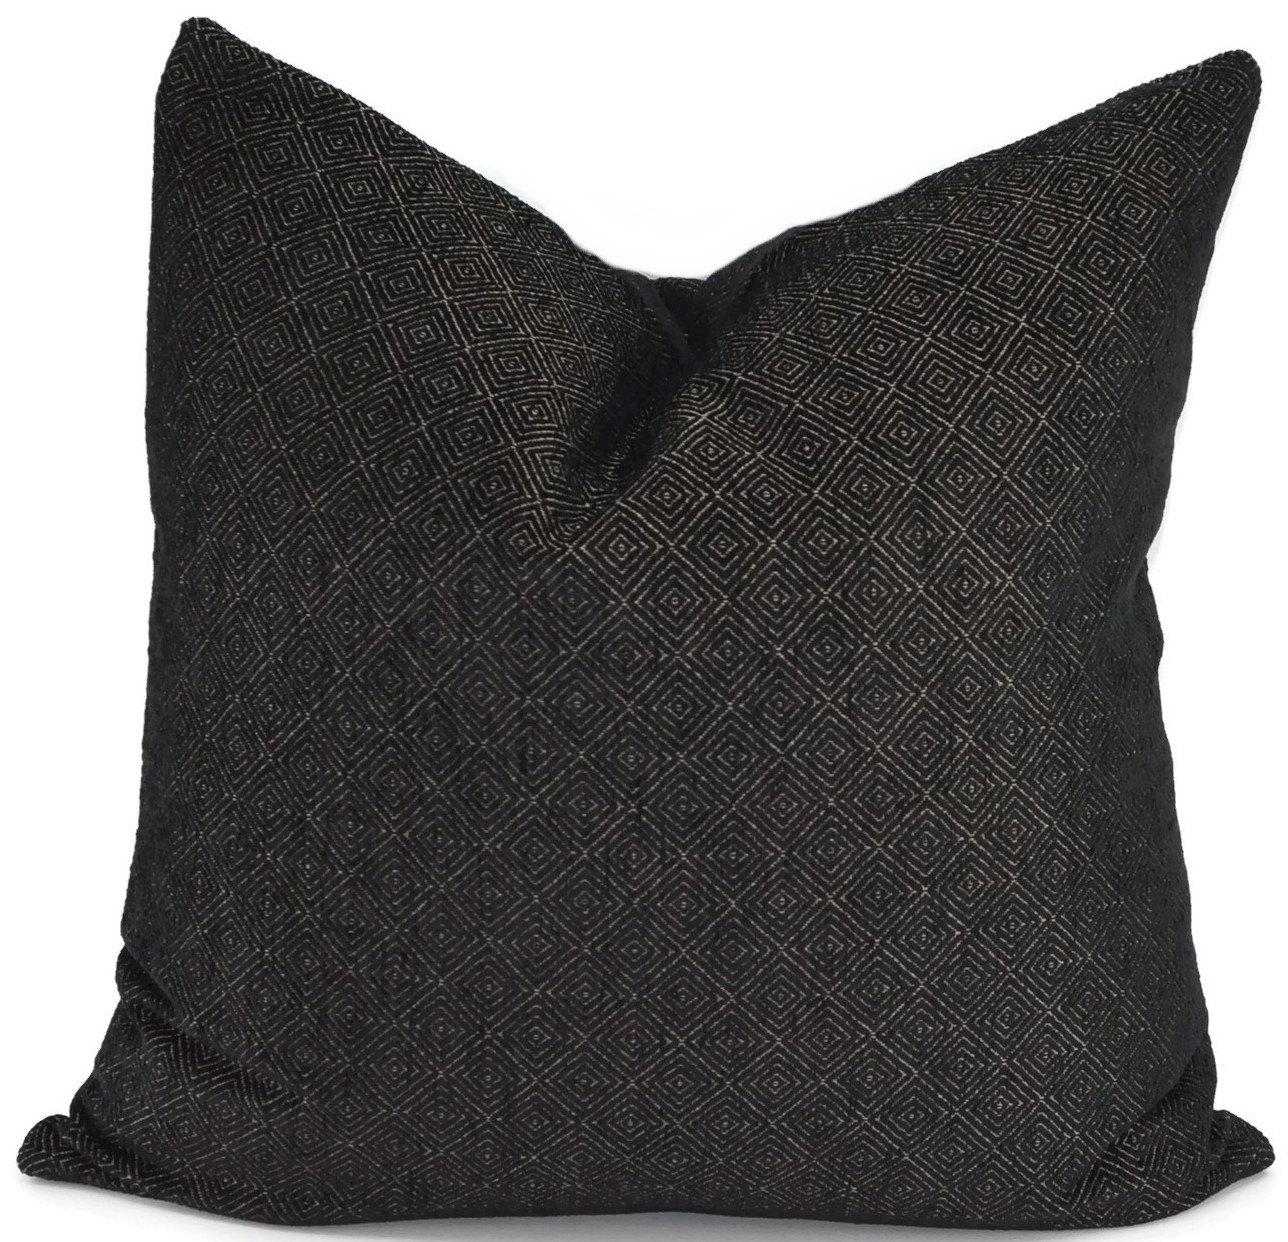 Black Chenille Throw Pillows : Black & Gold Diamond Print Chenille Pillow Cover Throw Pillow